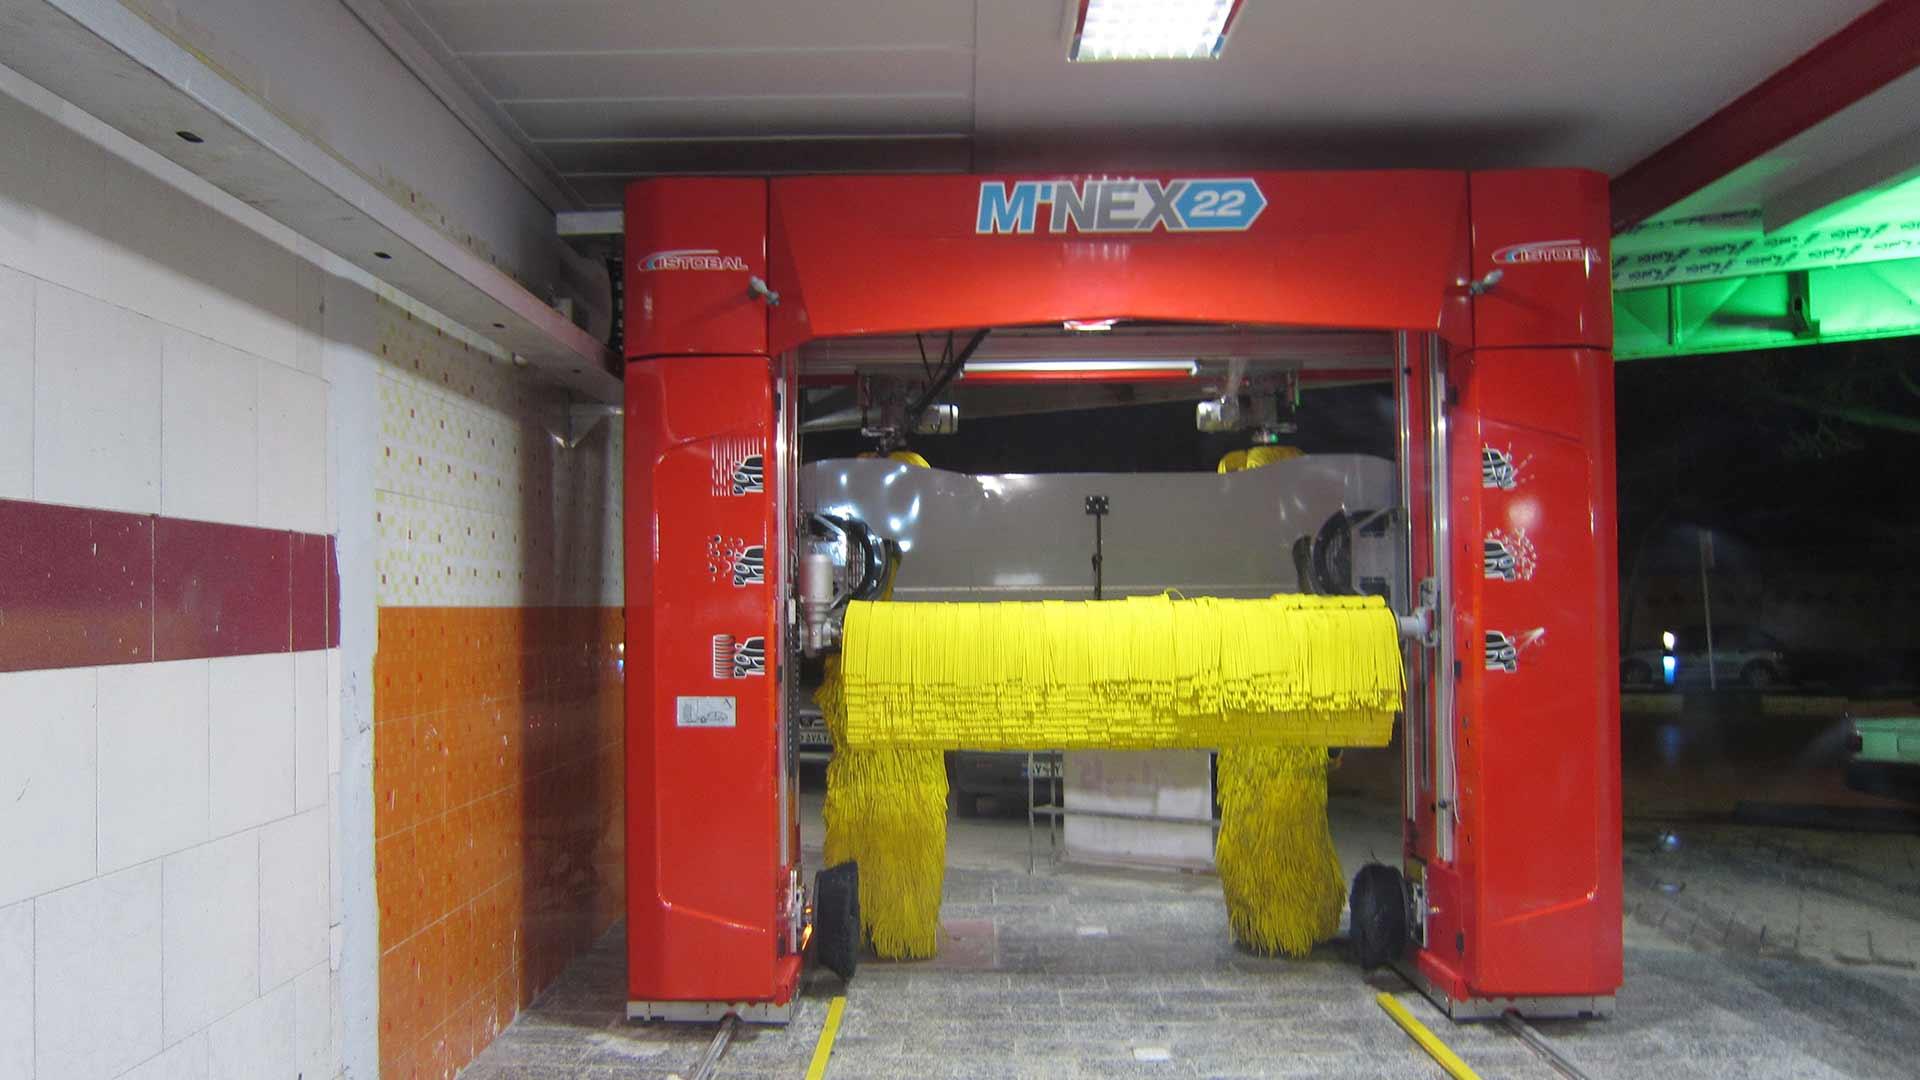 mnex22 کارواش اتوماتیک مشهد